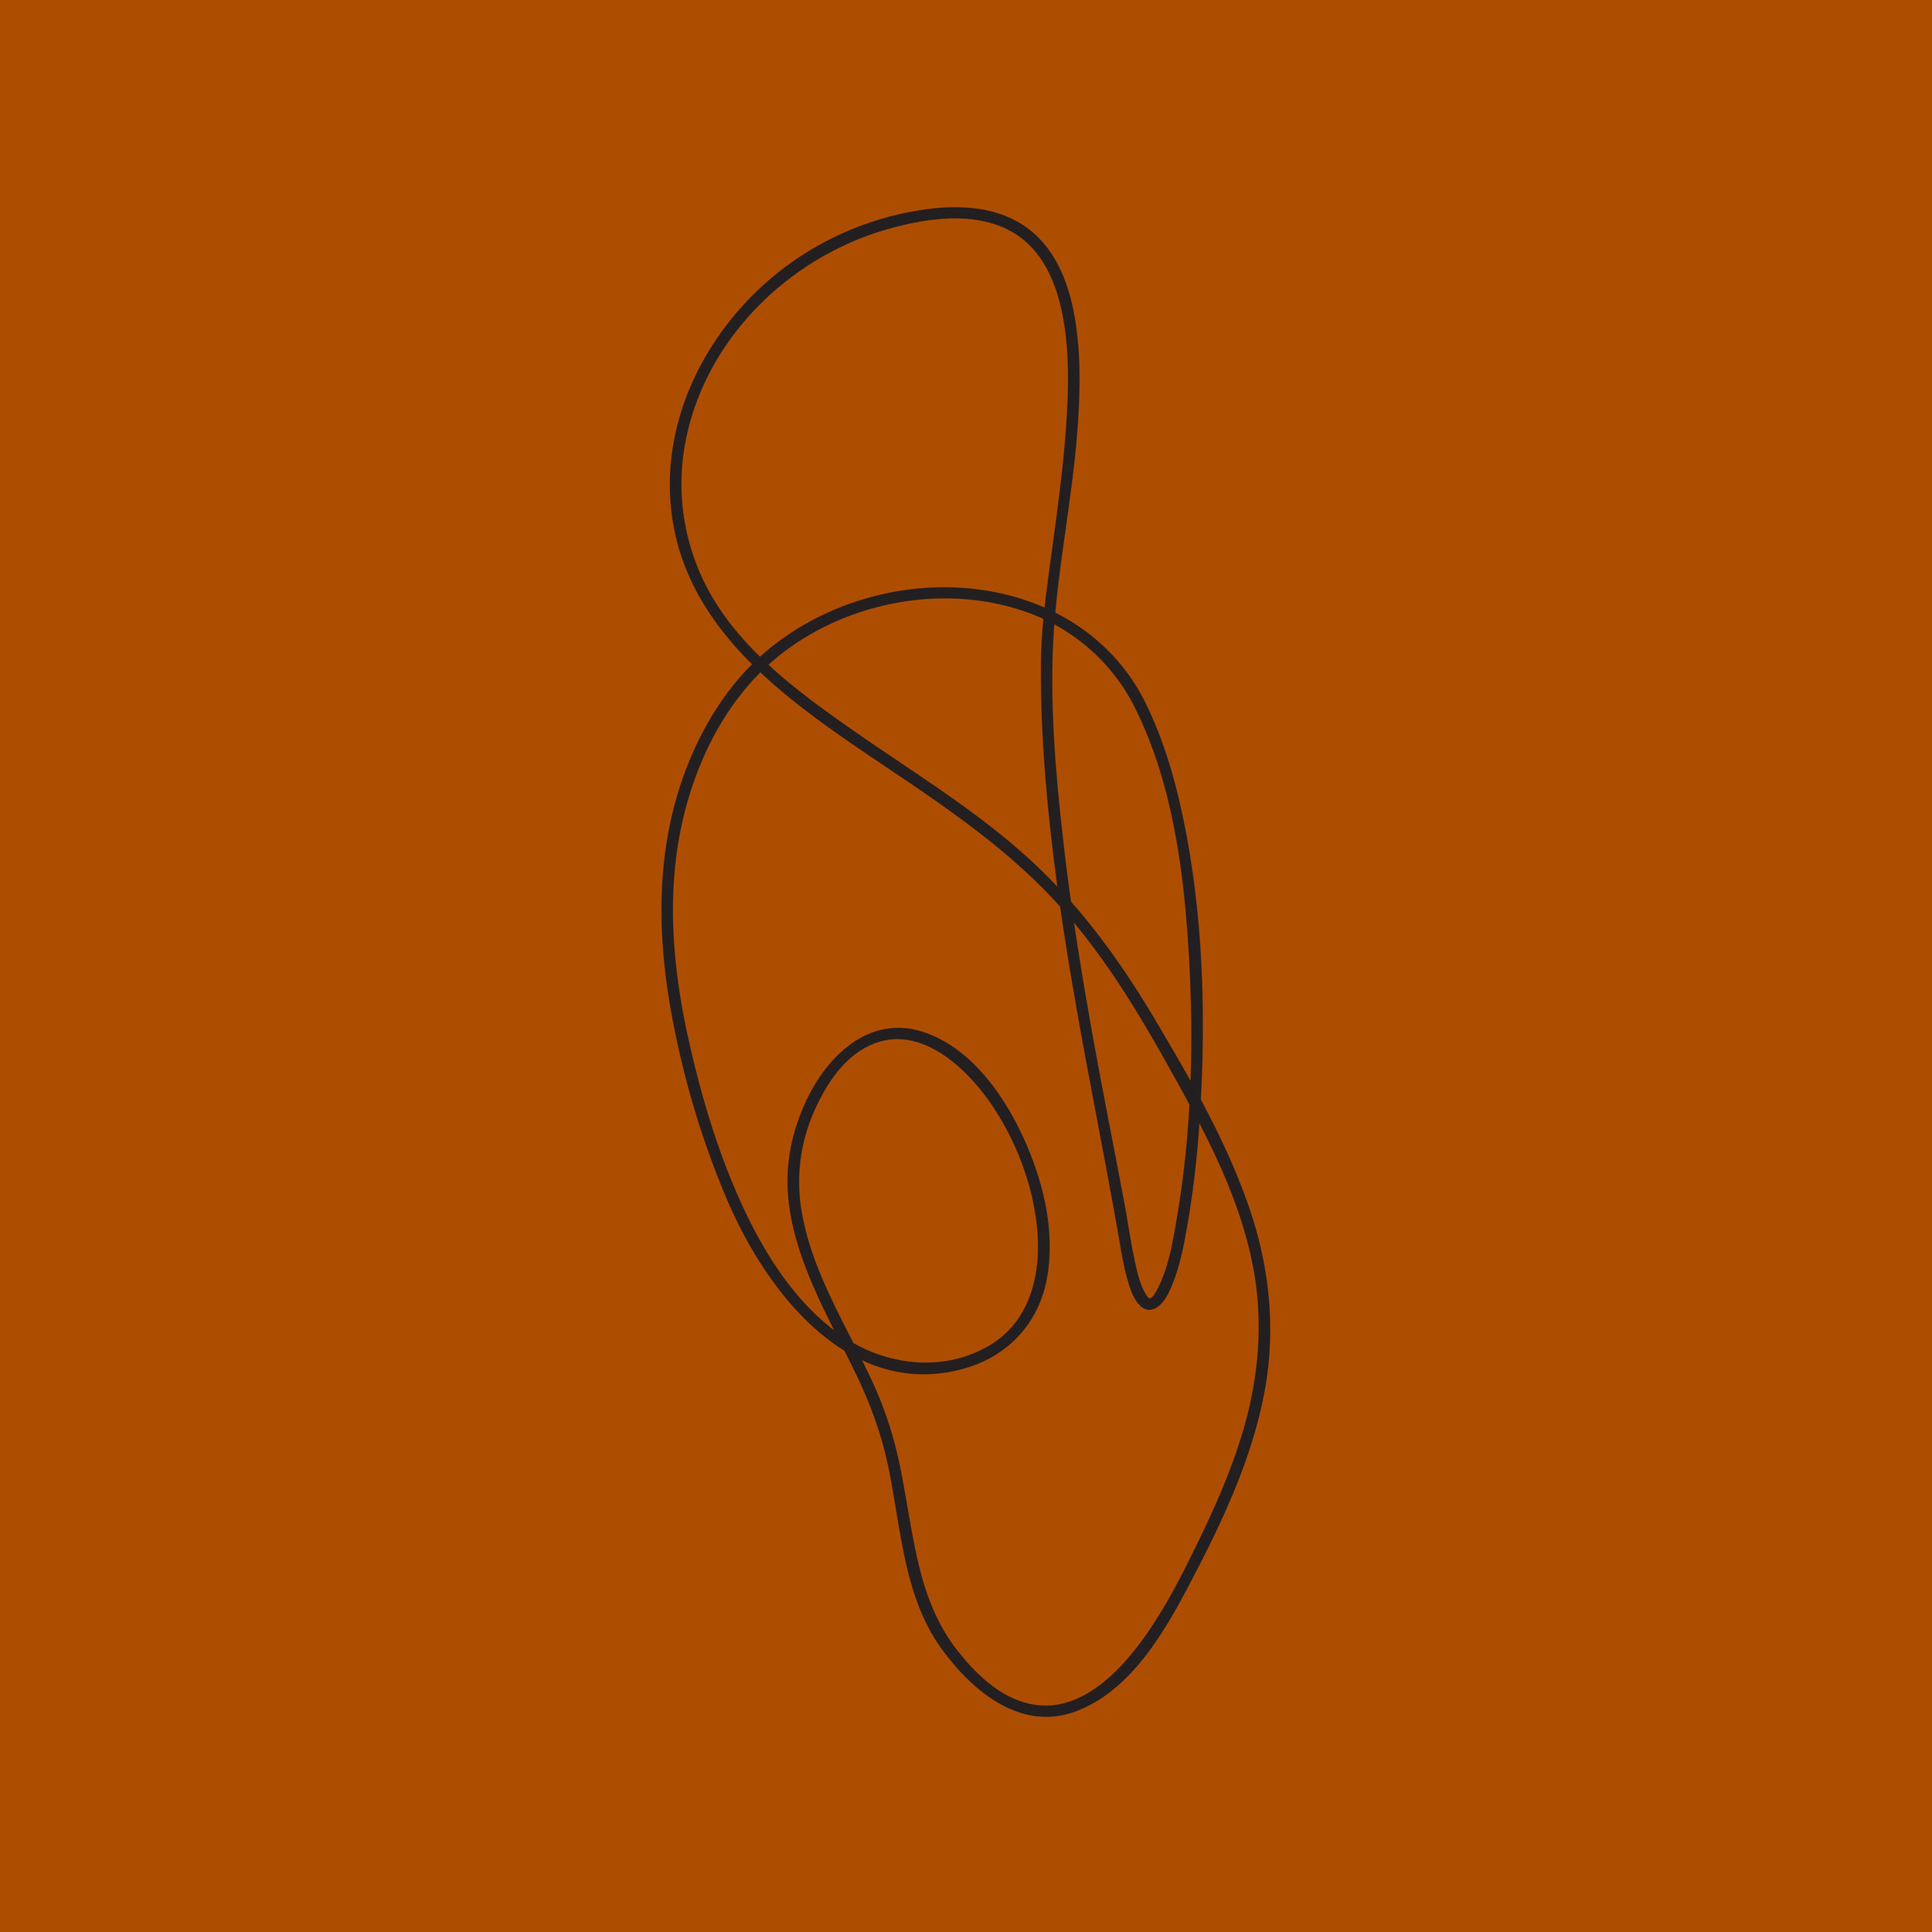 doodles-5.jpg